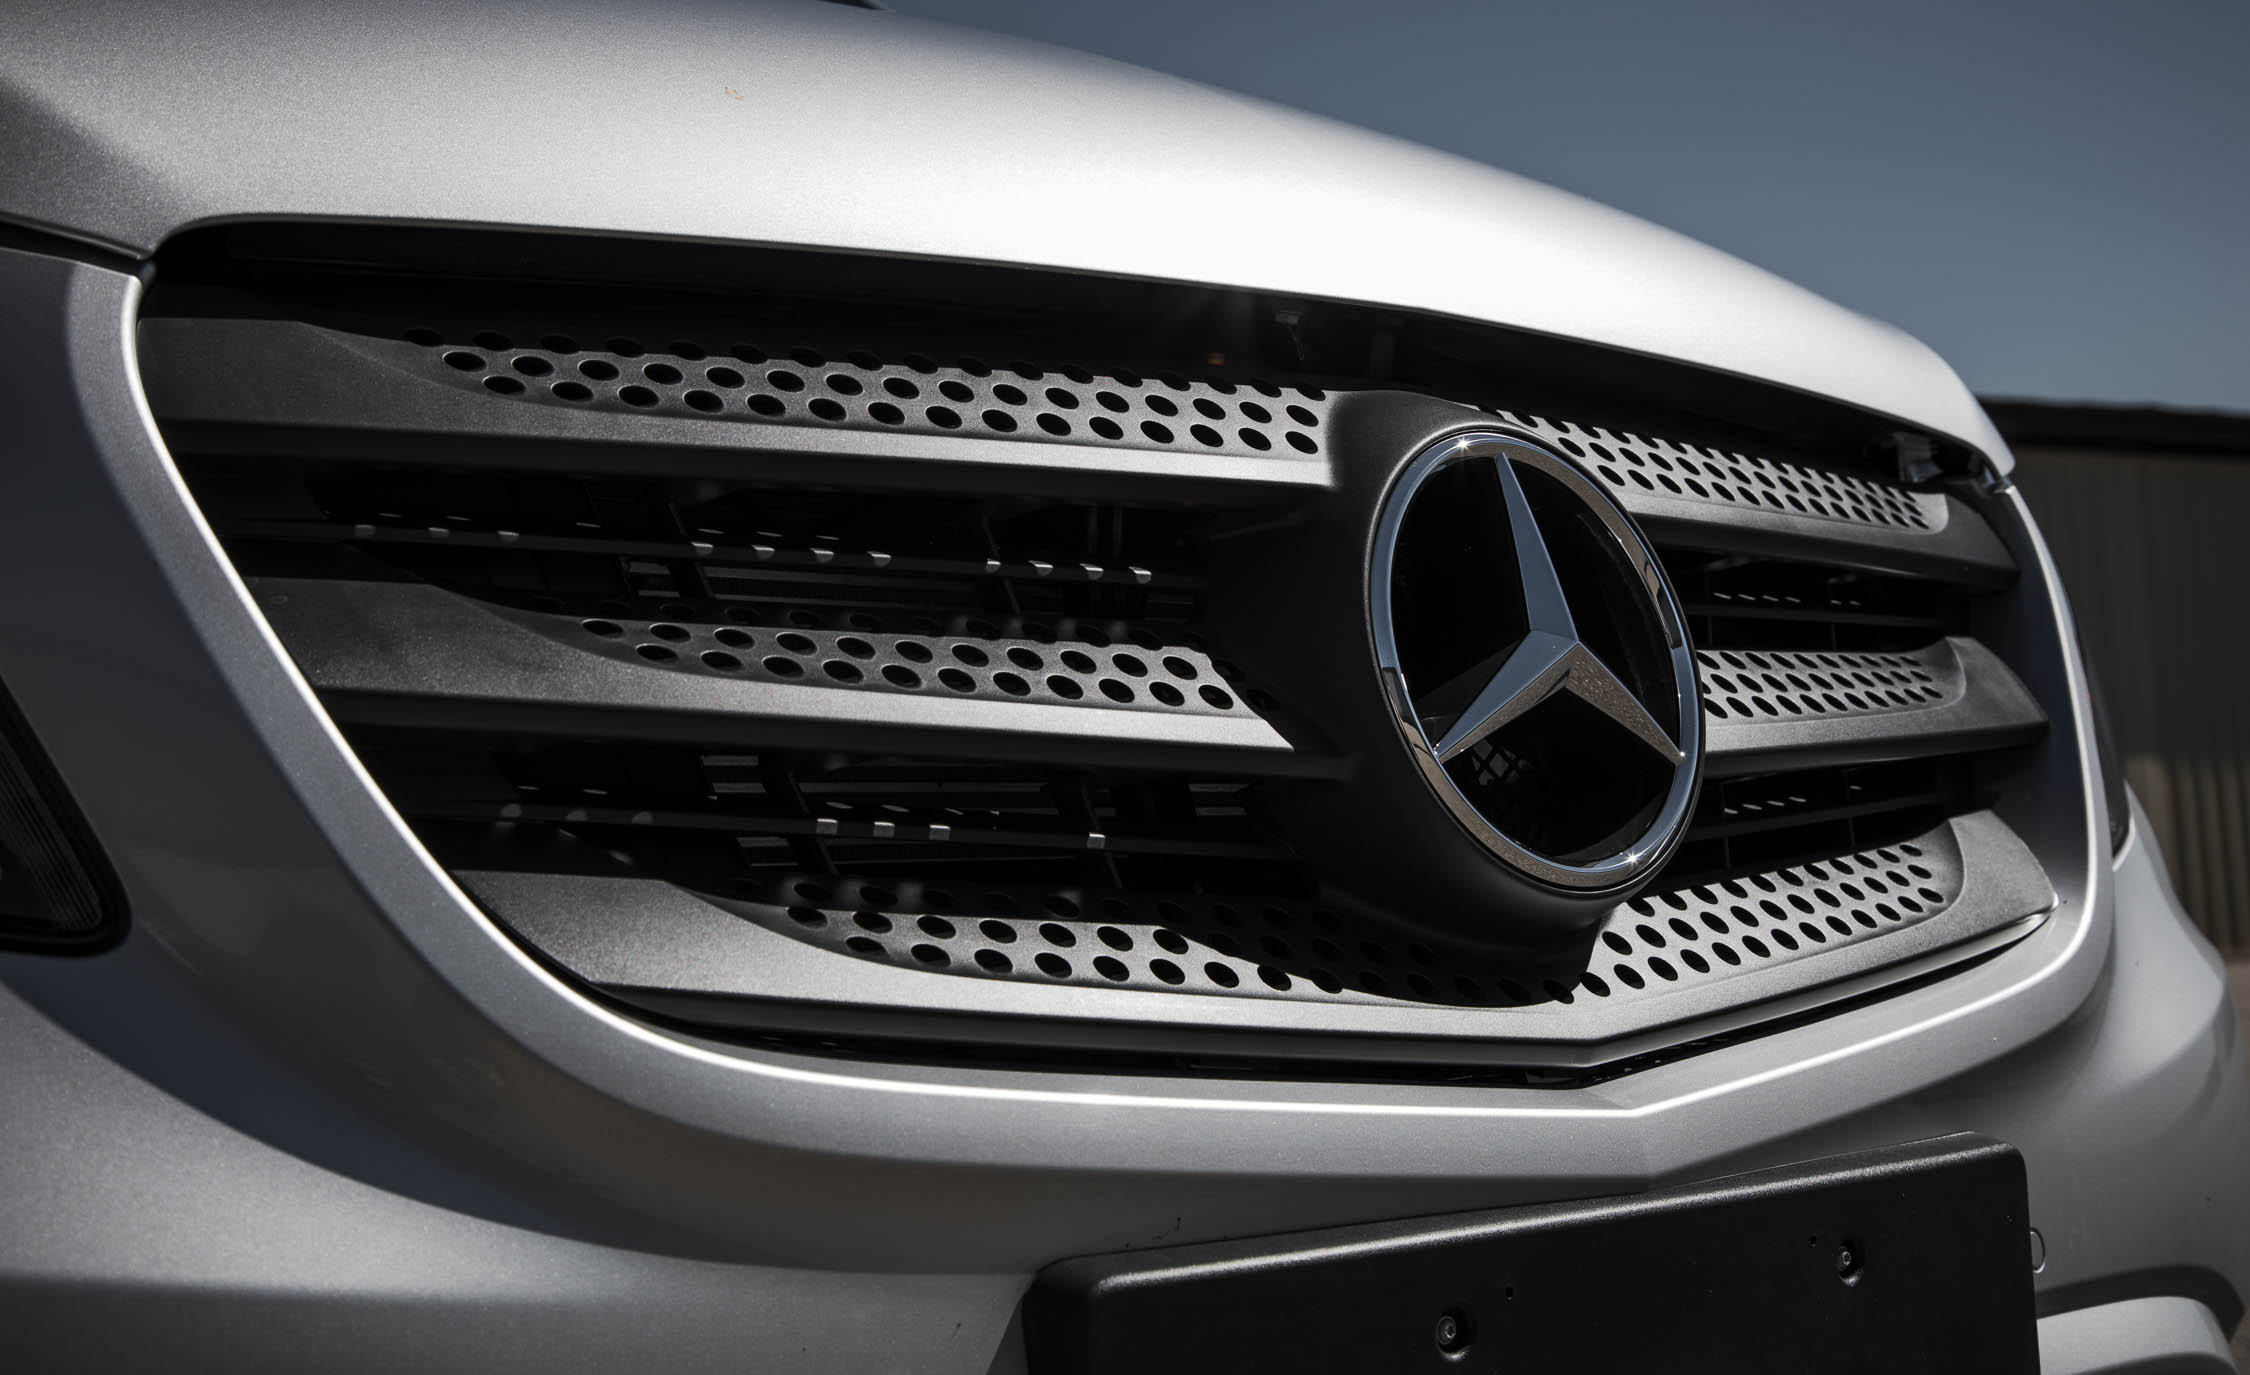 2016 Mercedes-Benz Metris Exterior Grille and Badge